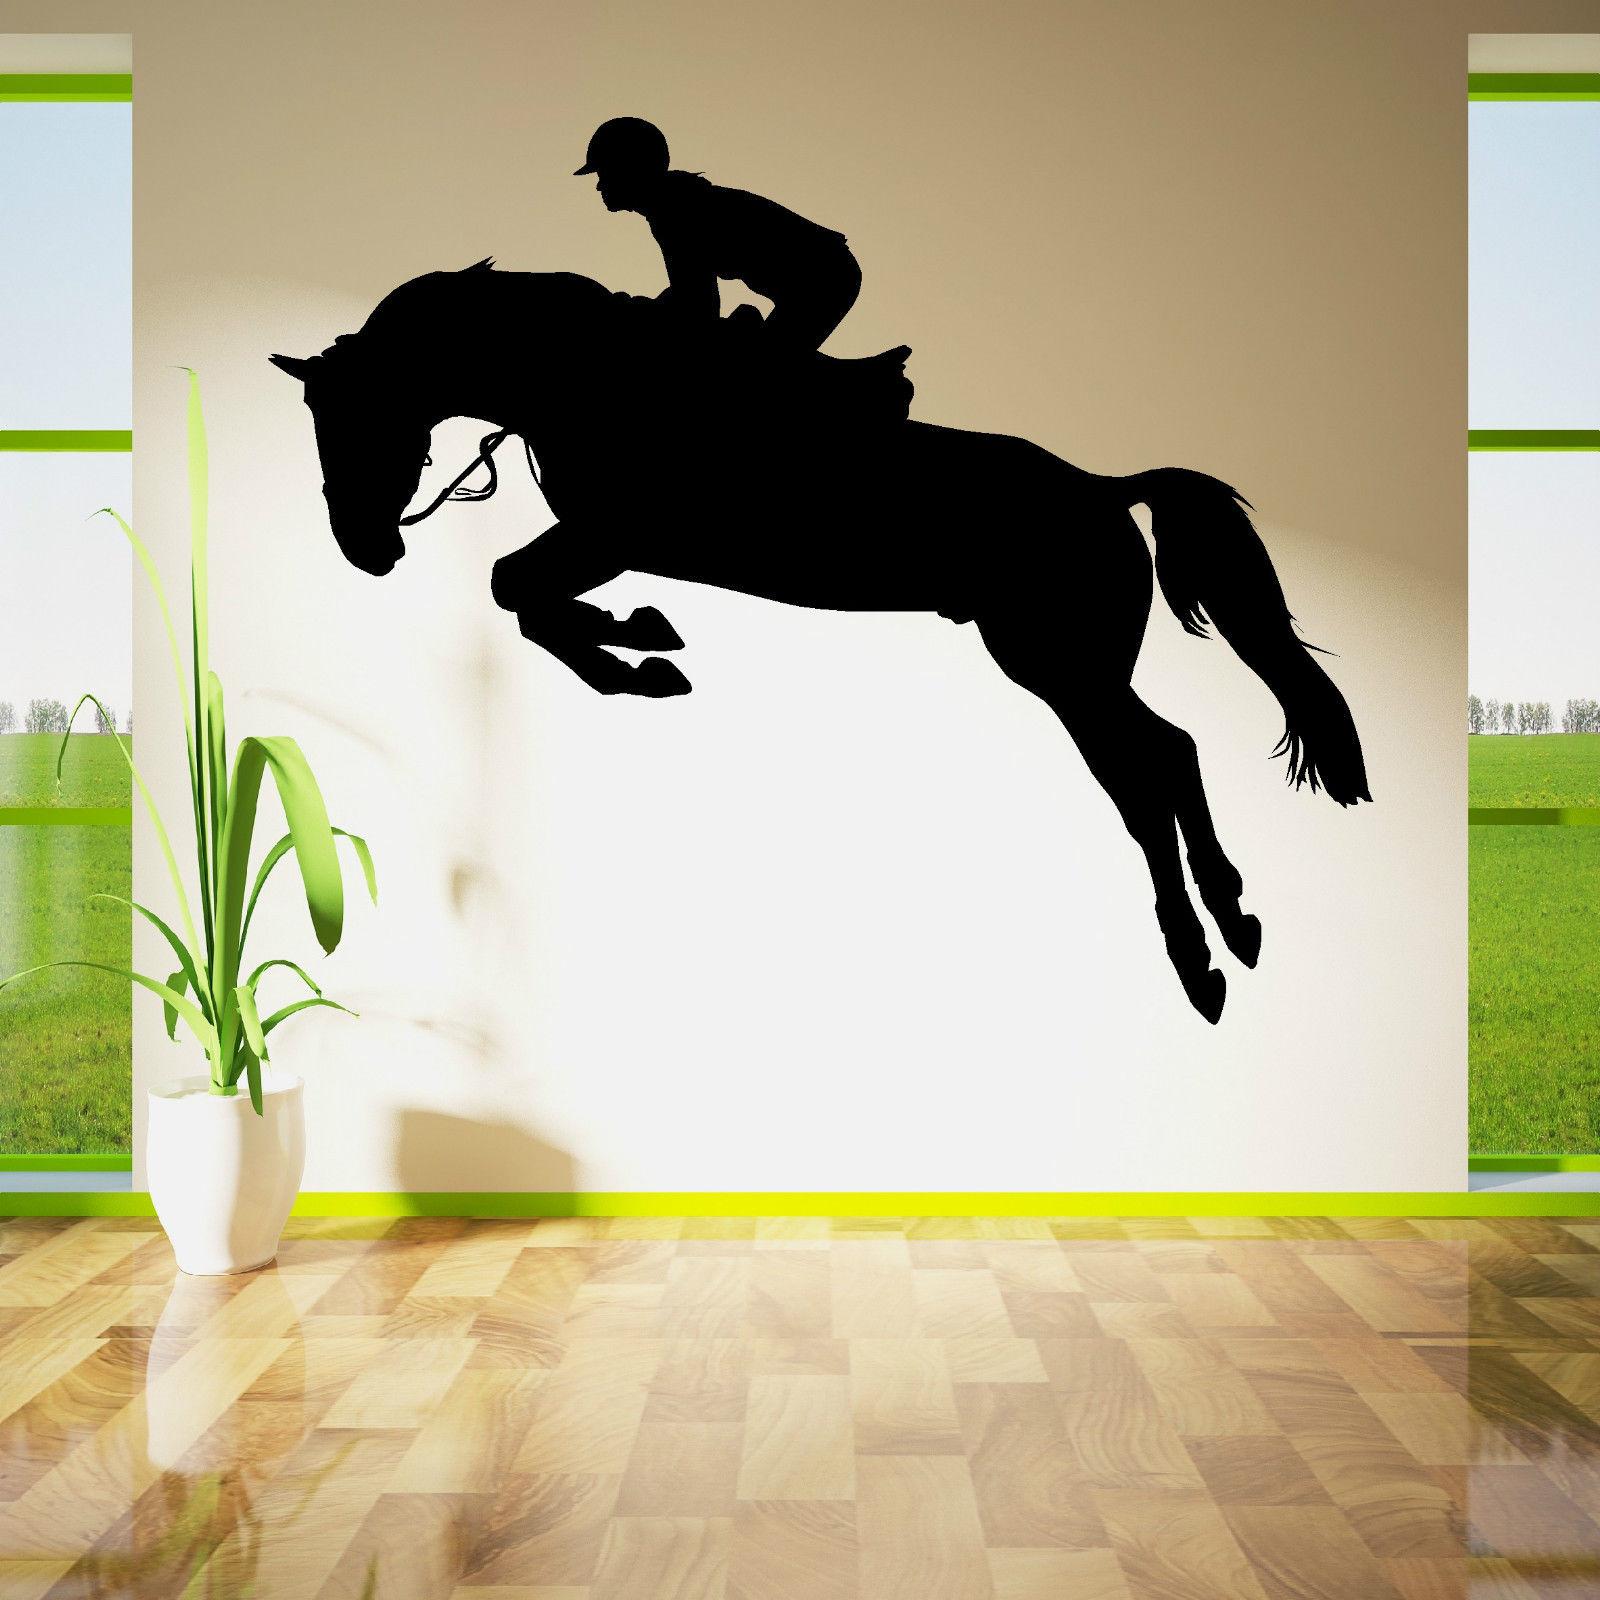 W209 HORSE JUMPING SHOW HORSE RIDER JOCKEY Vinyl wall art sticker decal(China (Mainland))